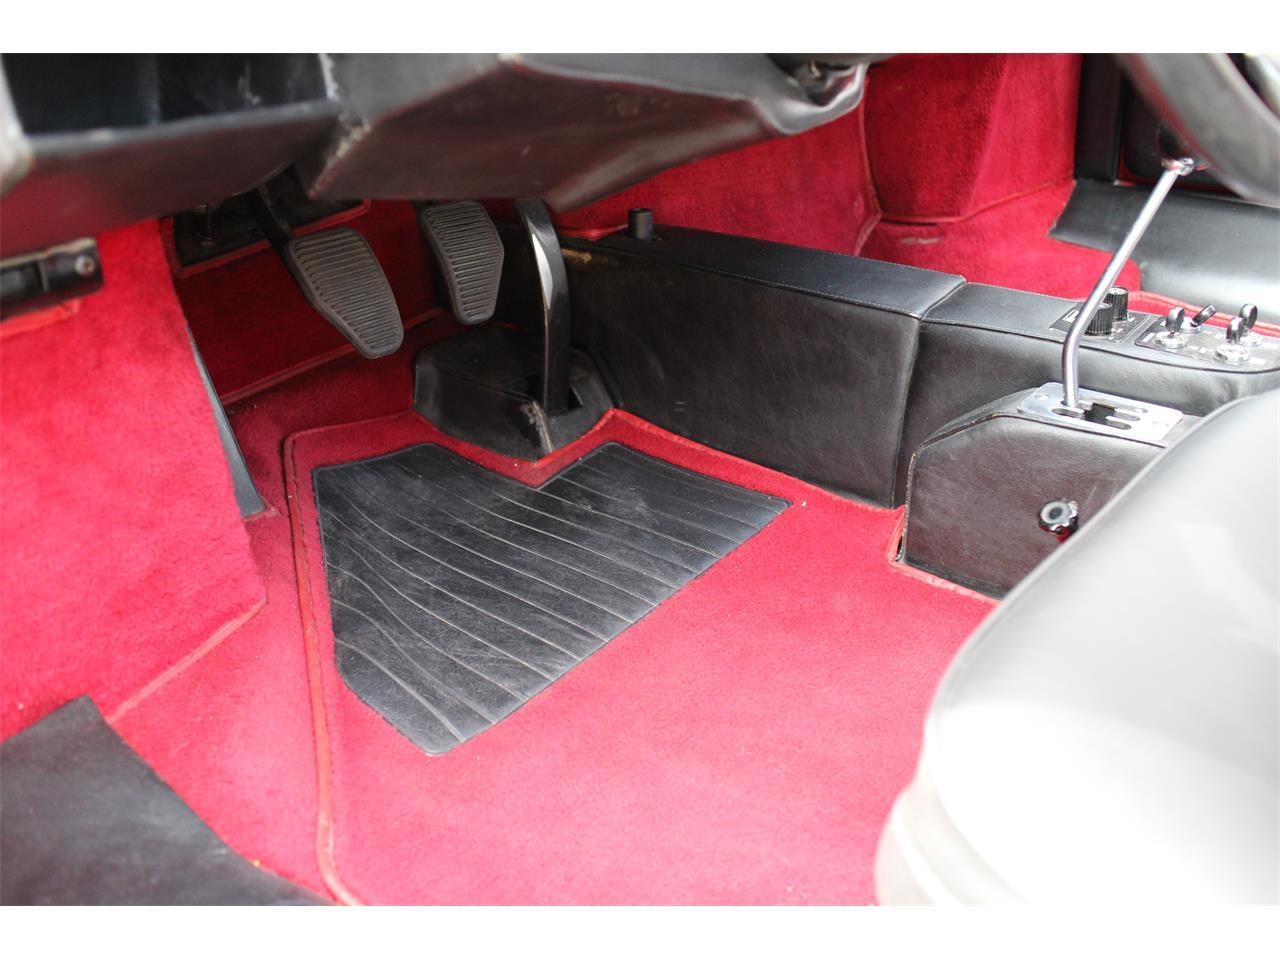 1974 Ferrari 365 GT4 (CC-1299863) for sale in New York, New York